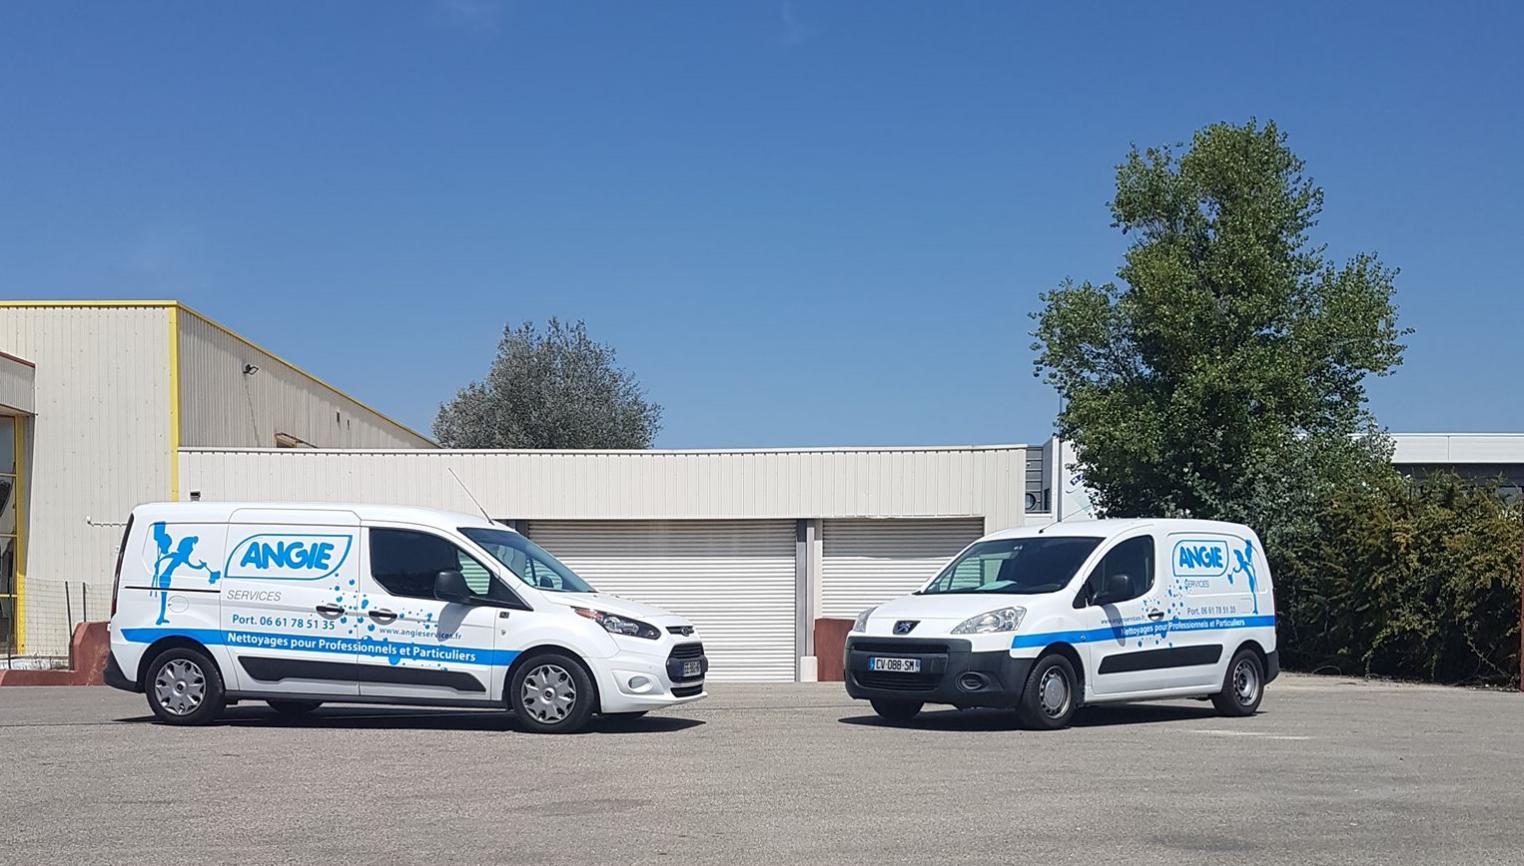 Angie Service - Nettoyage Vaucluse (84)